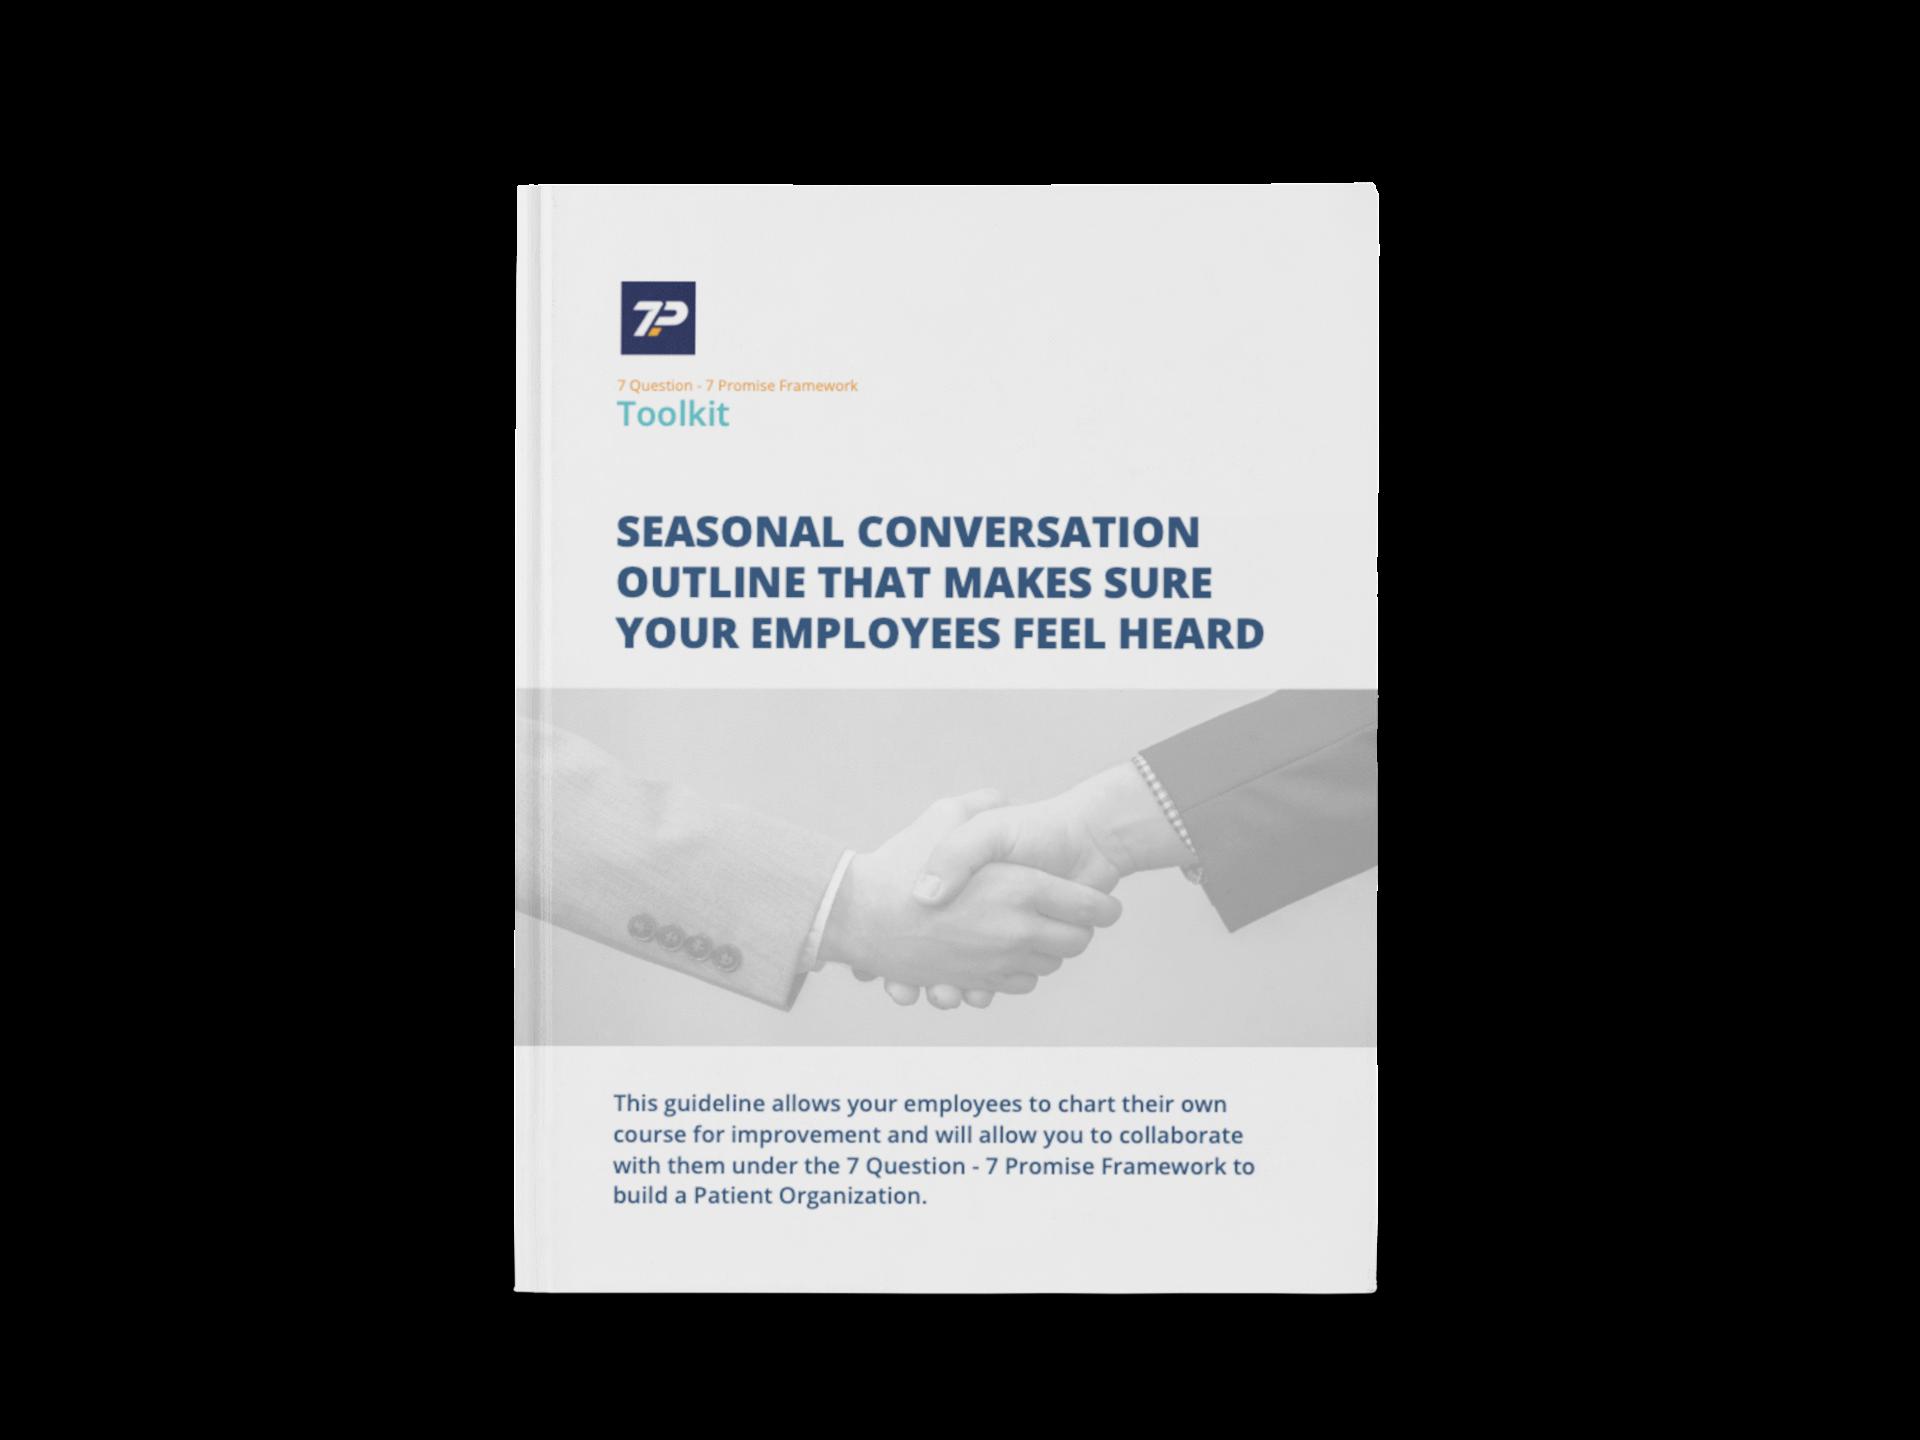 7Q7P Toolkit Seasonal Conversation